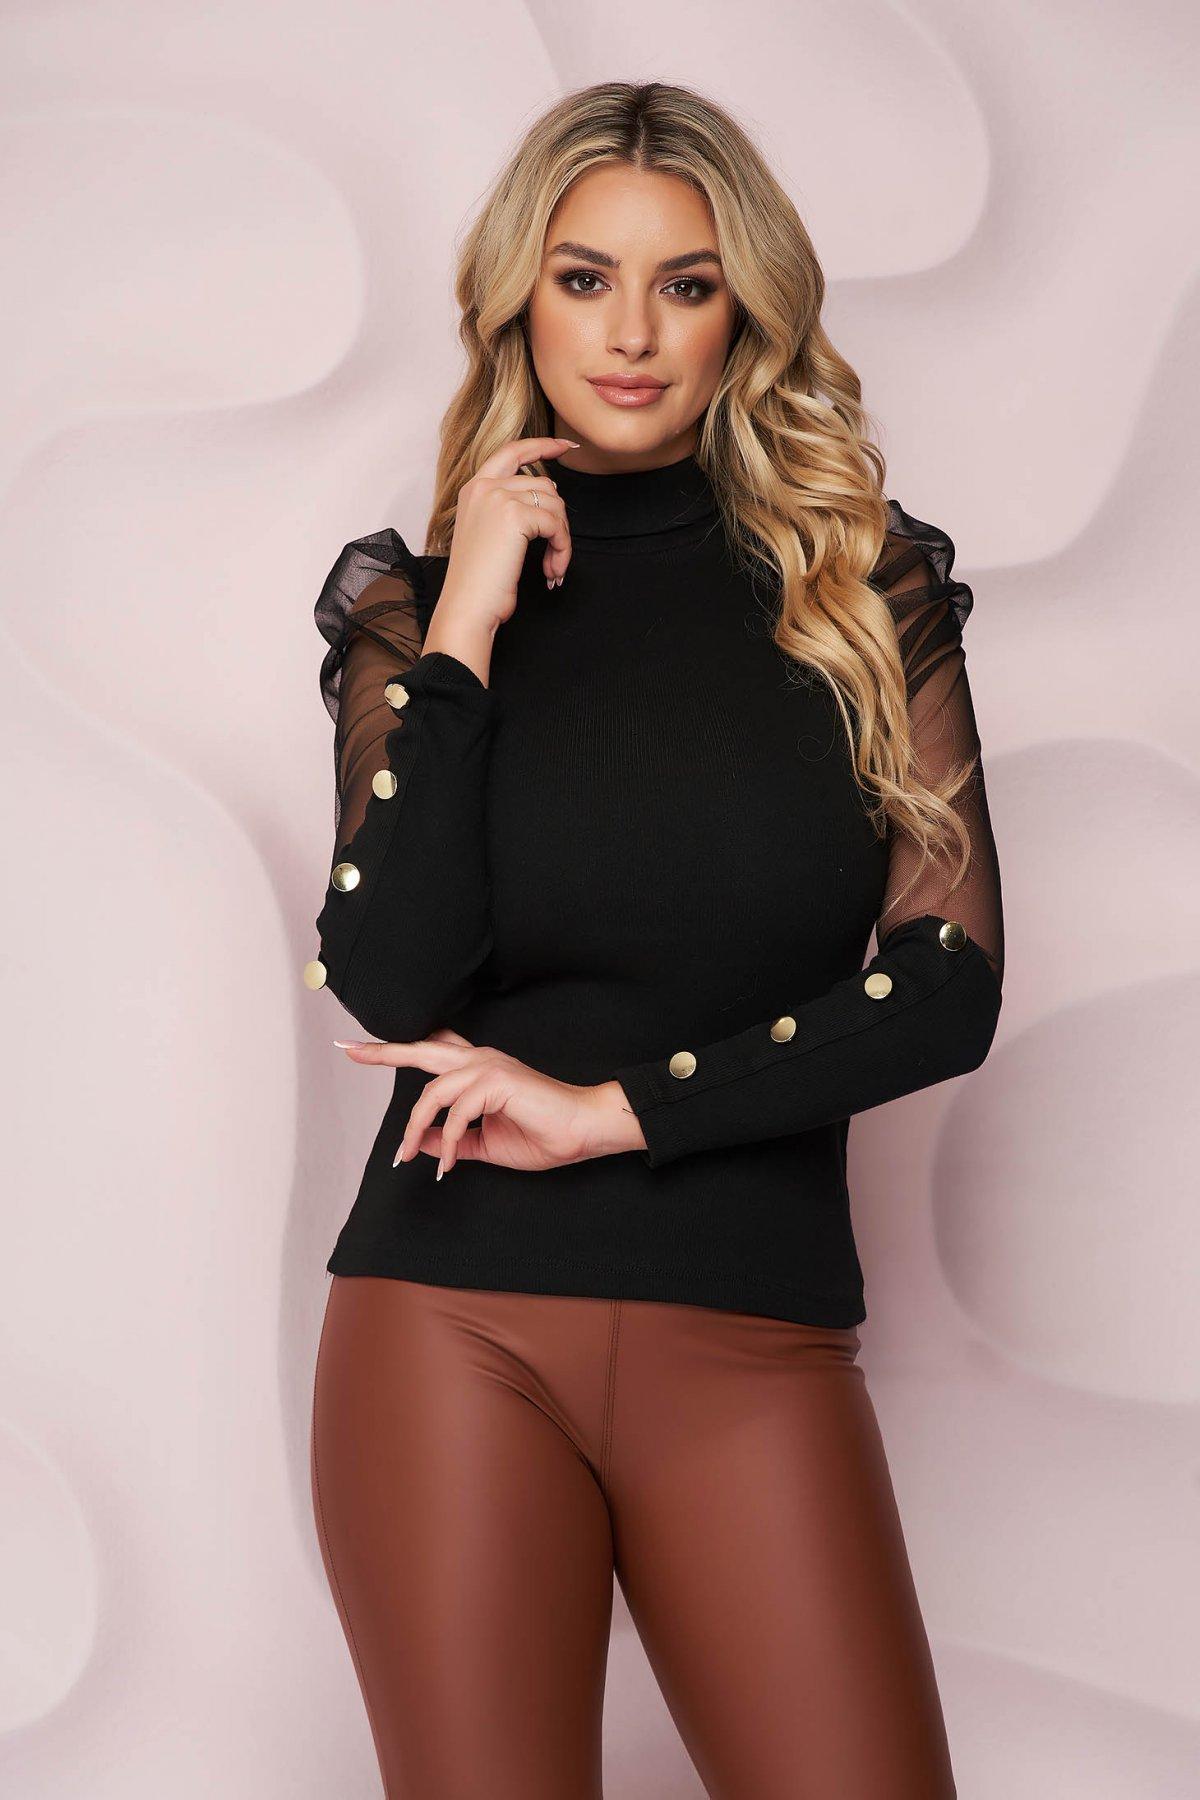 Bluza dama SunShine neagra mulata cu maneca lunga din bumbac elastic si maneci din tul accesorizata cu nasturi aurii